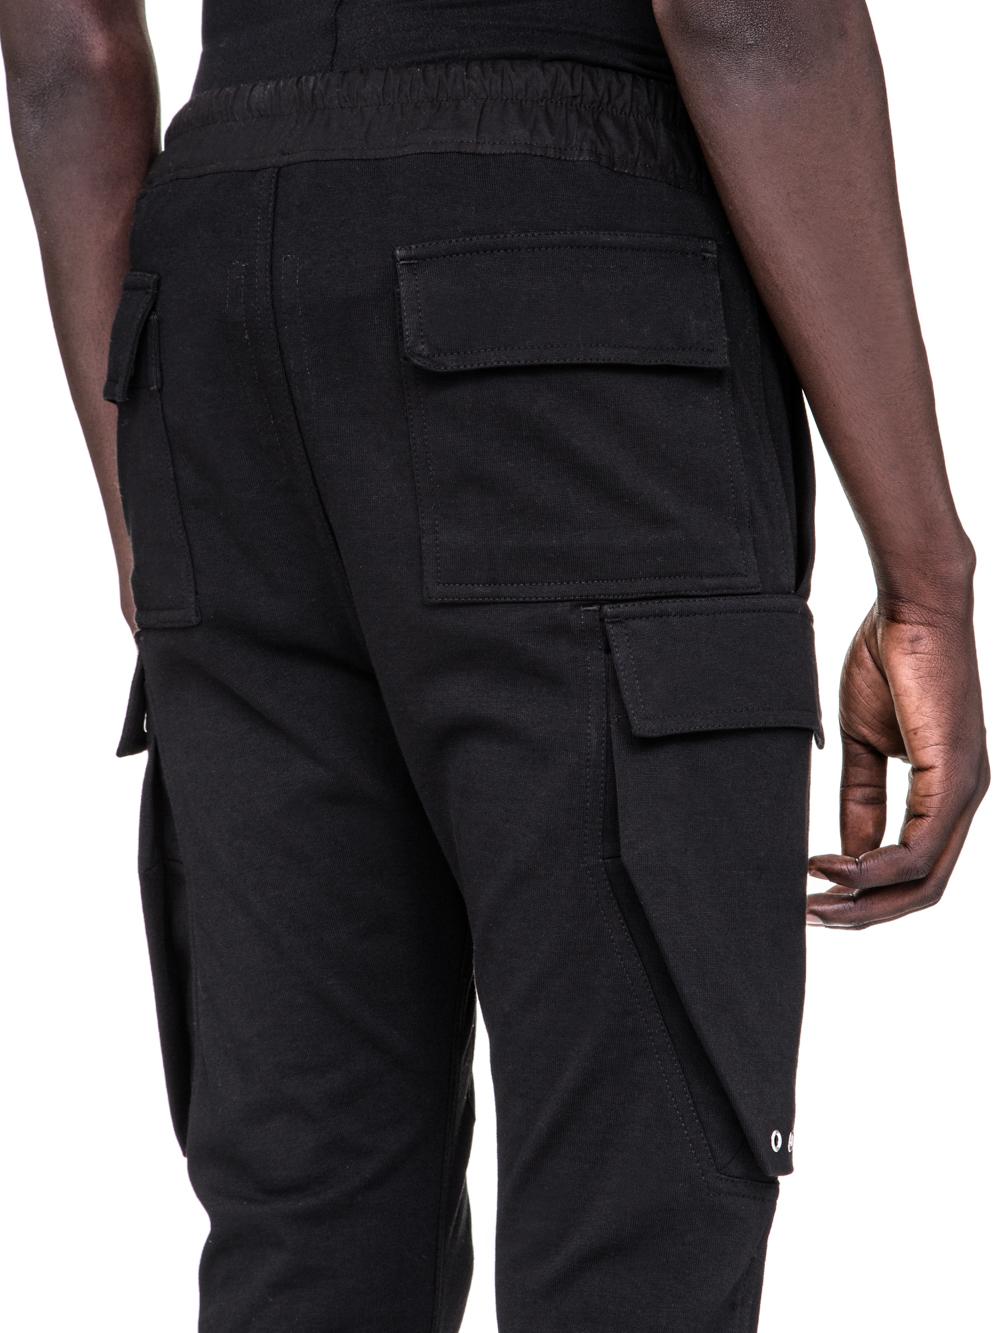 RICK OWENS SS19 BABEL CARGO JOG PANTS IN BLACK COTTON